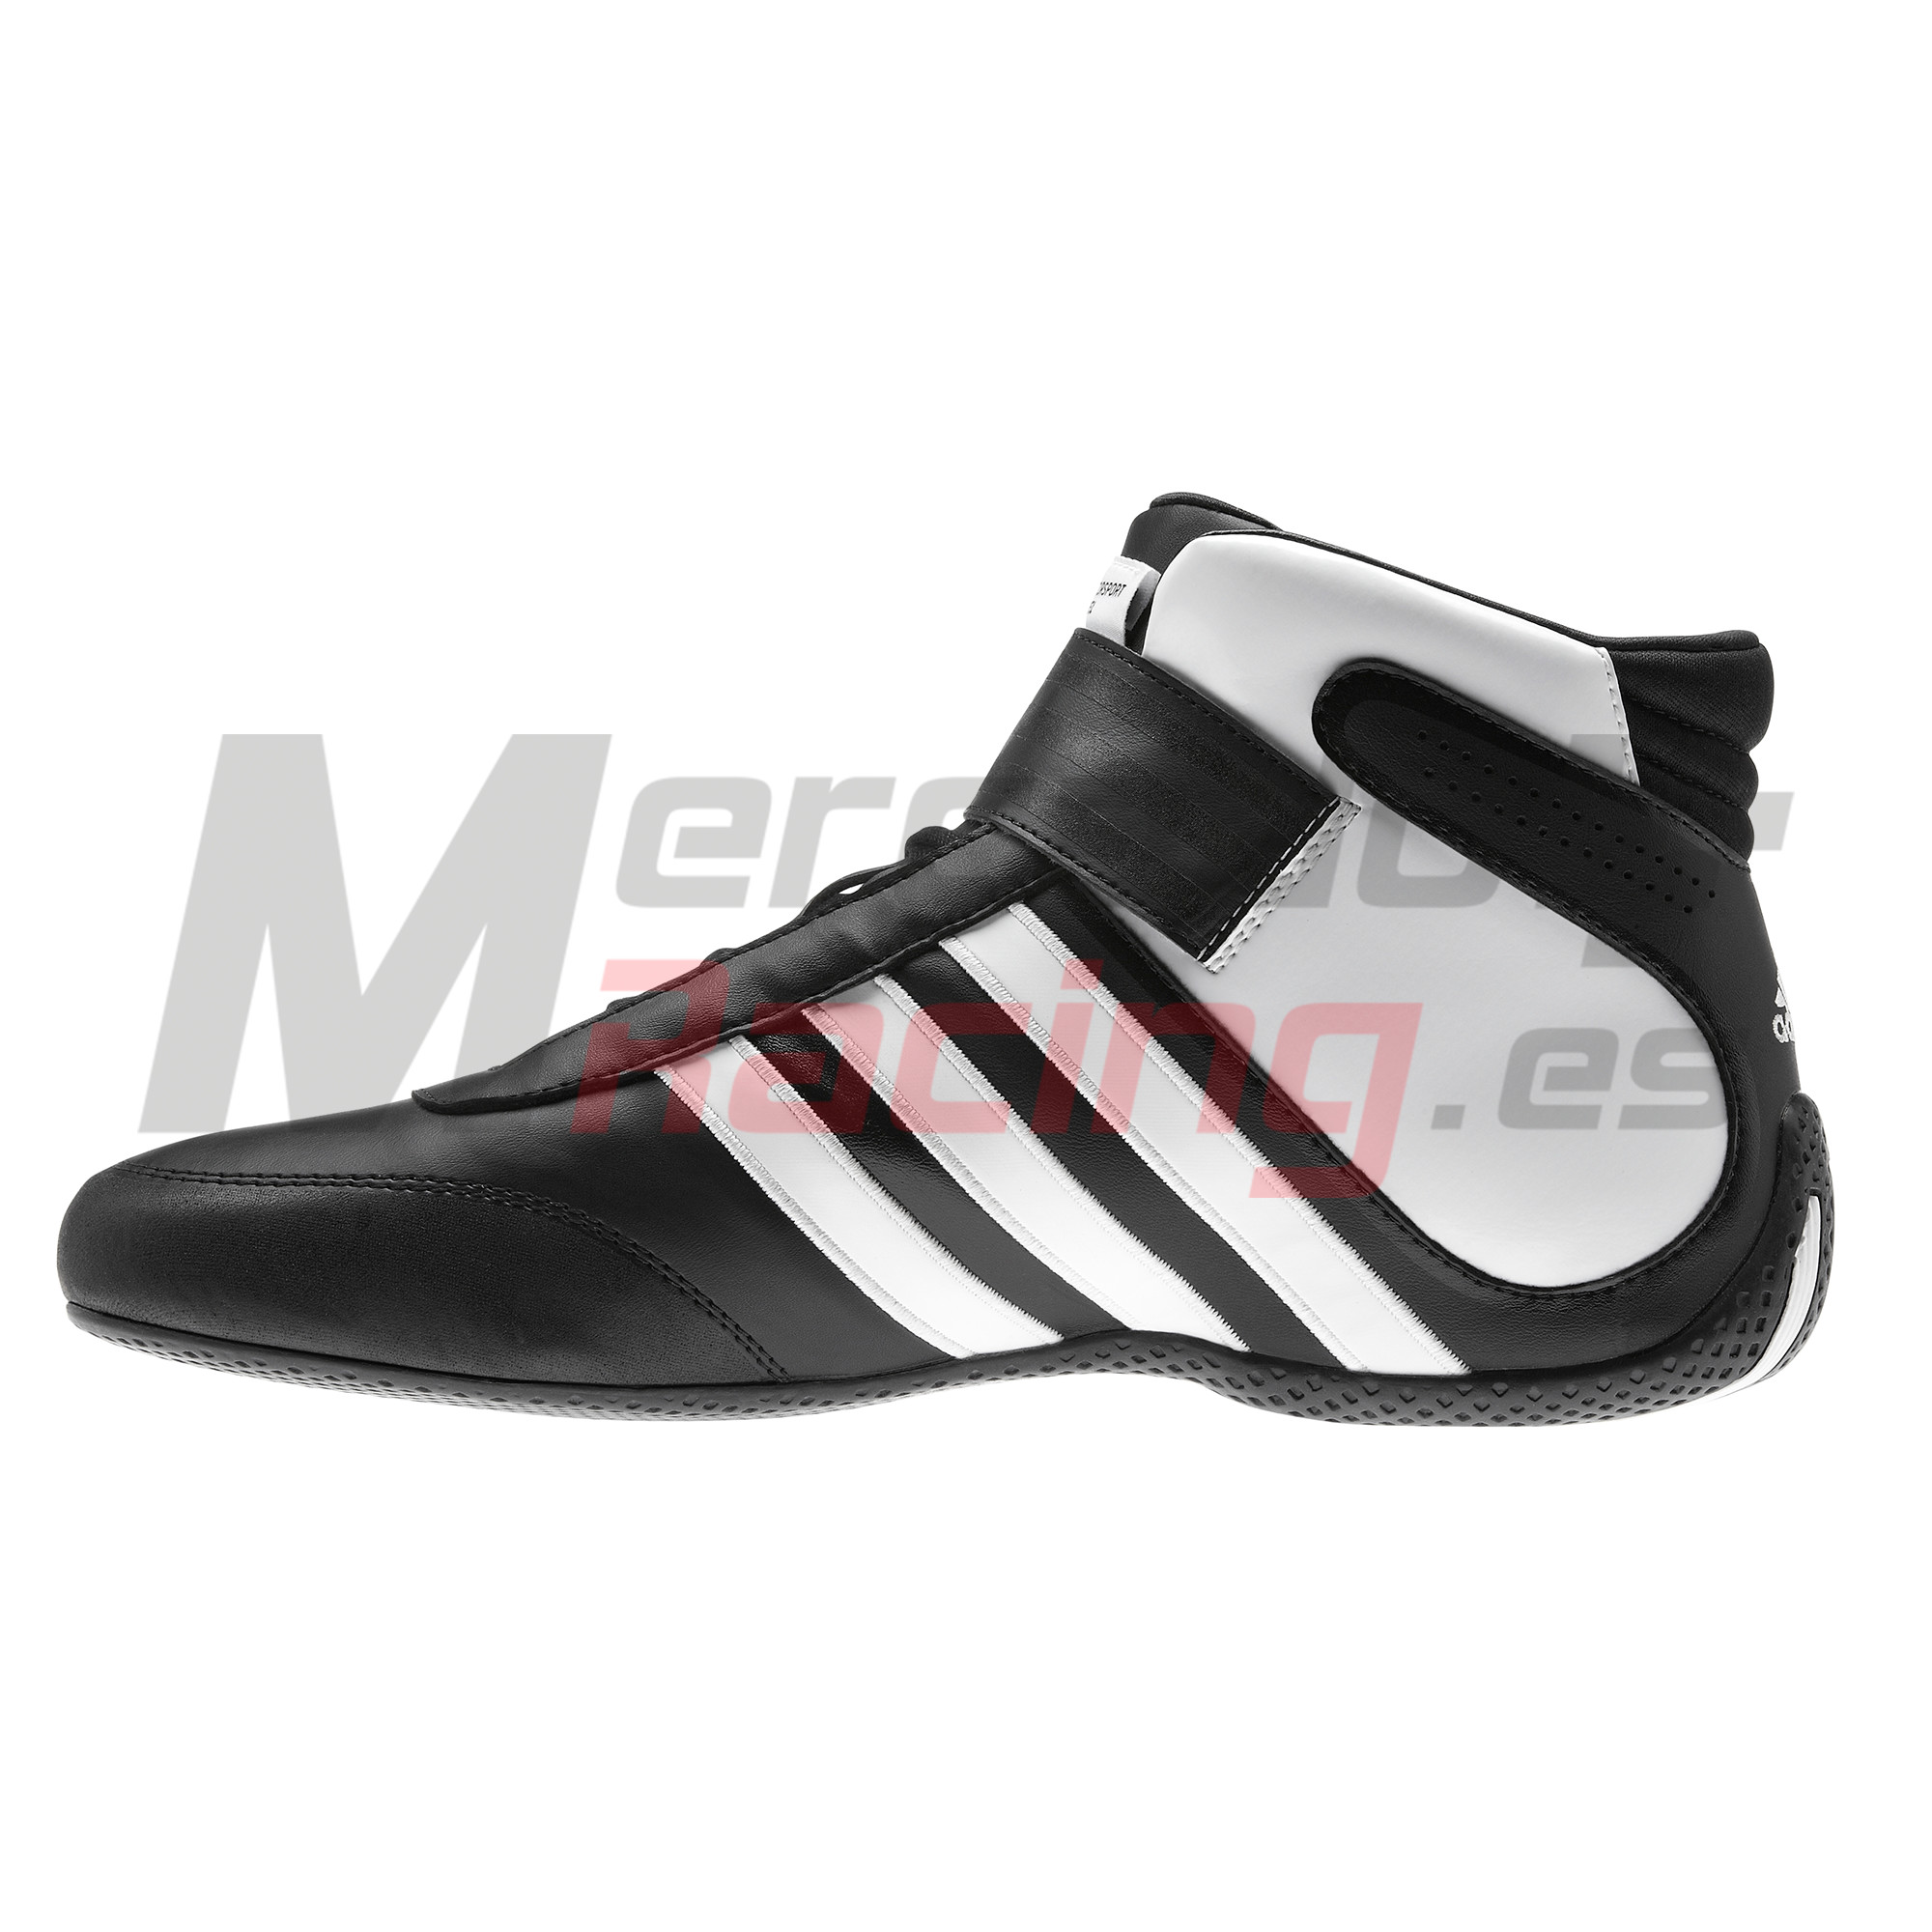 Adidas Blackwhite Karting Adidas Xlt Xlt nkP0w8OX